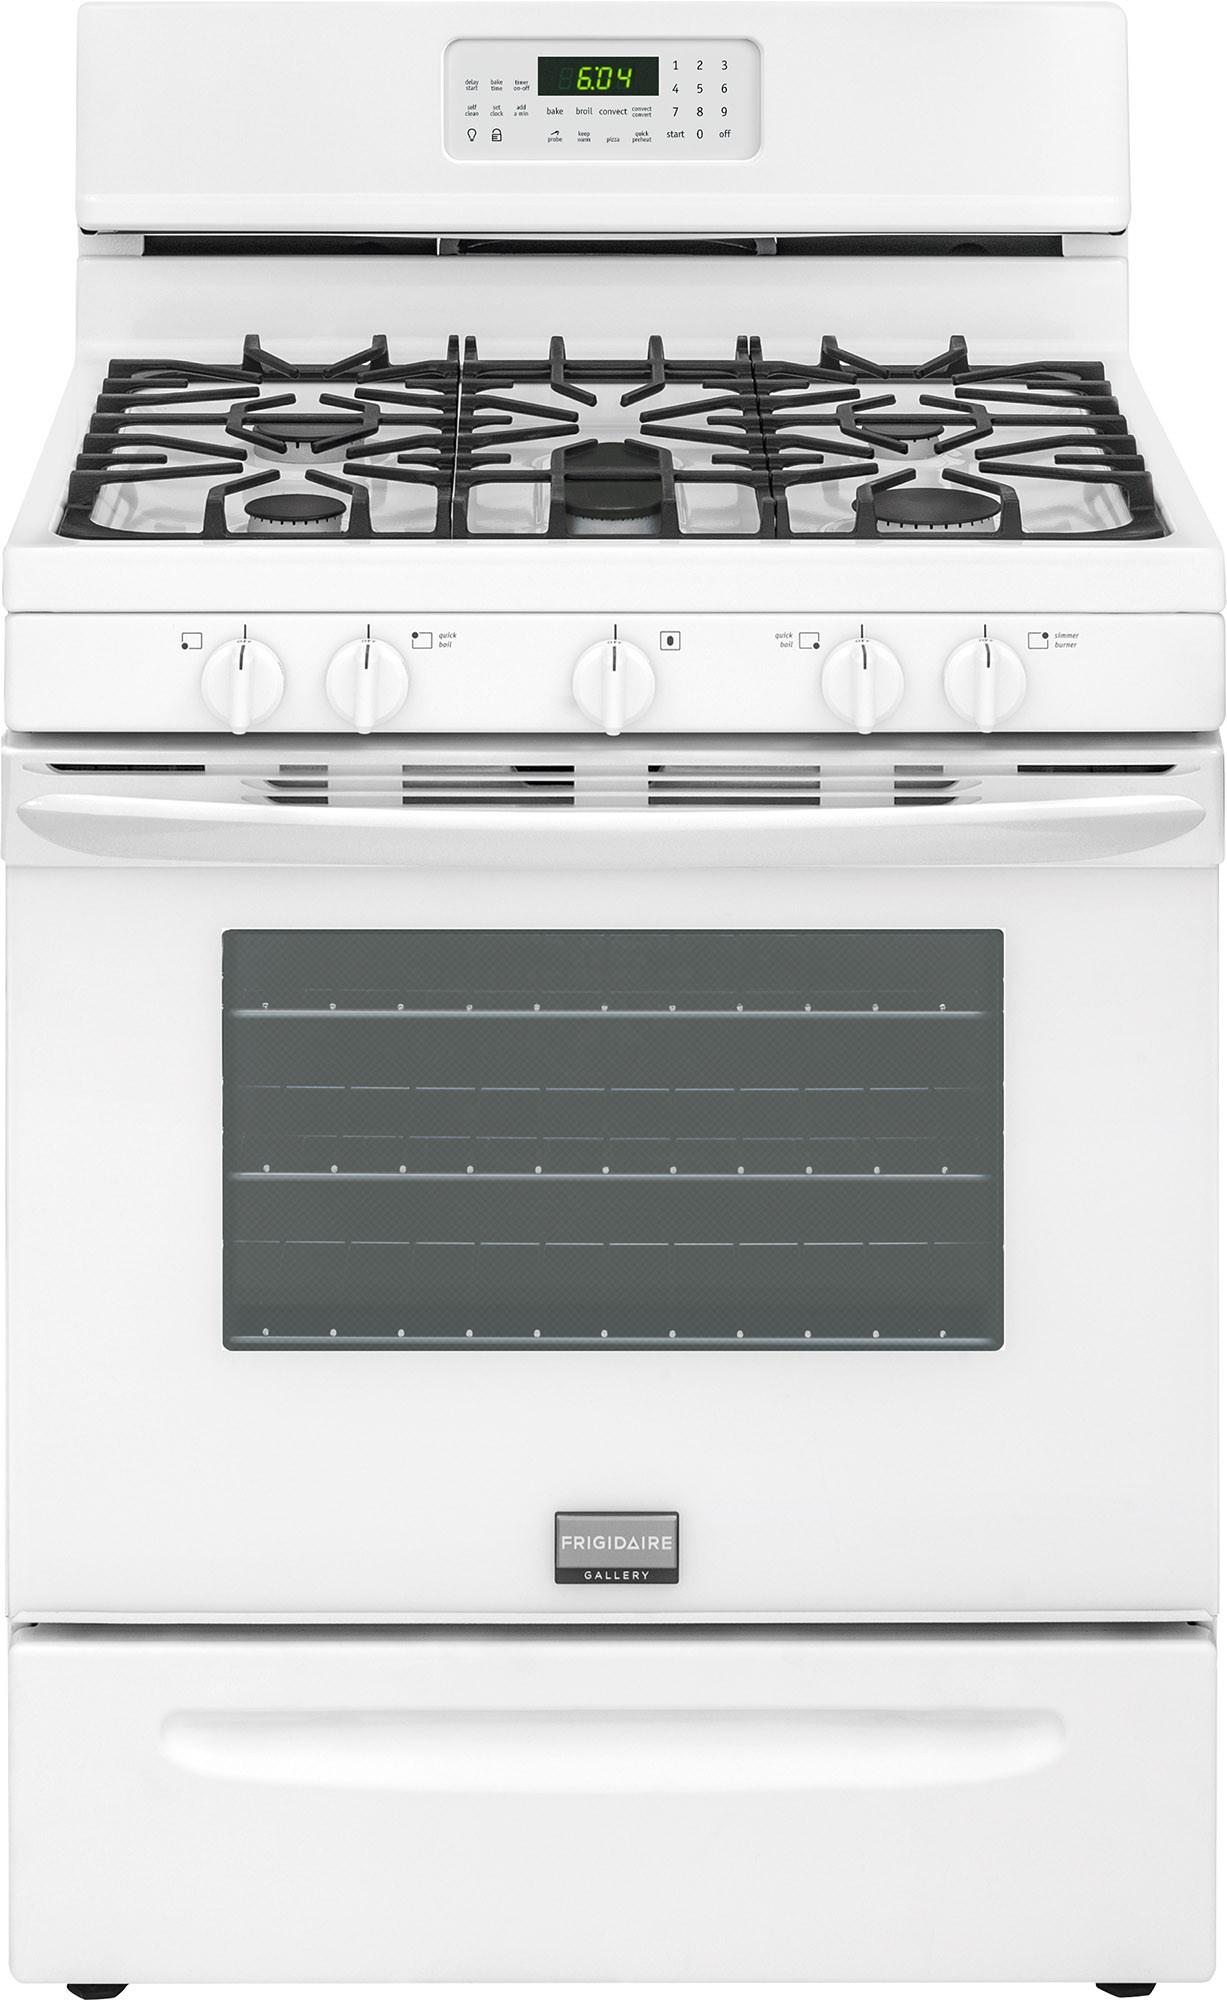 Pc Richards Kitchen Appliances Cooking Ranges Stoves